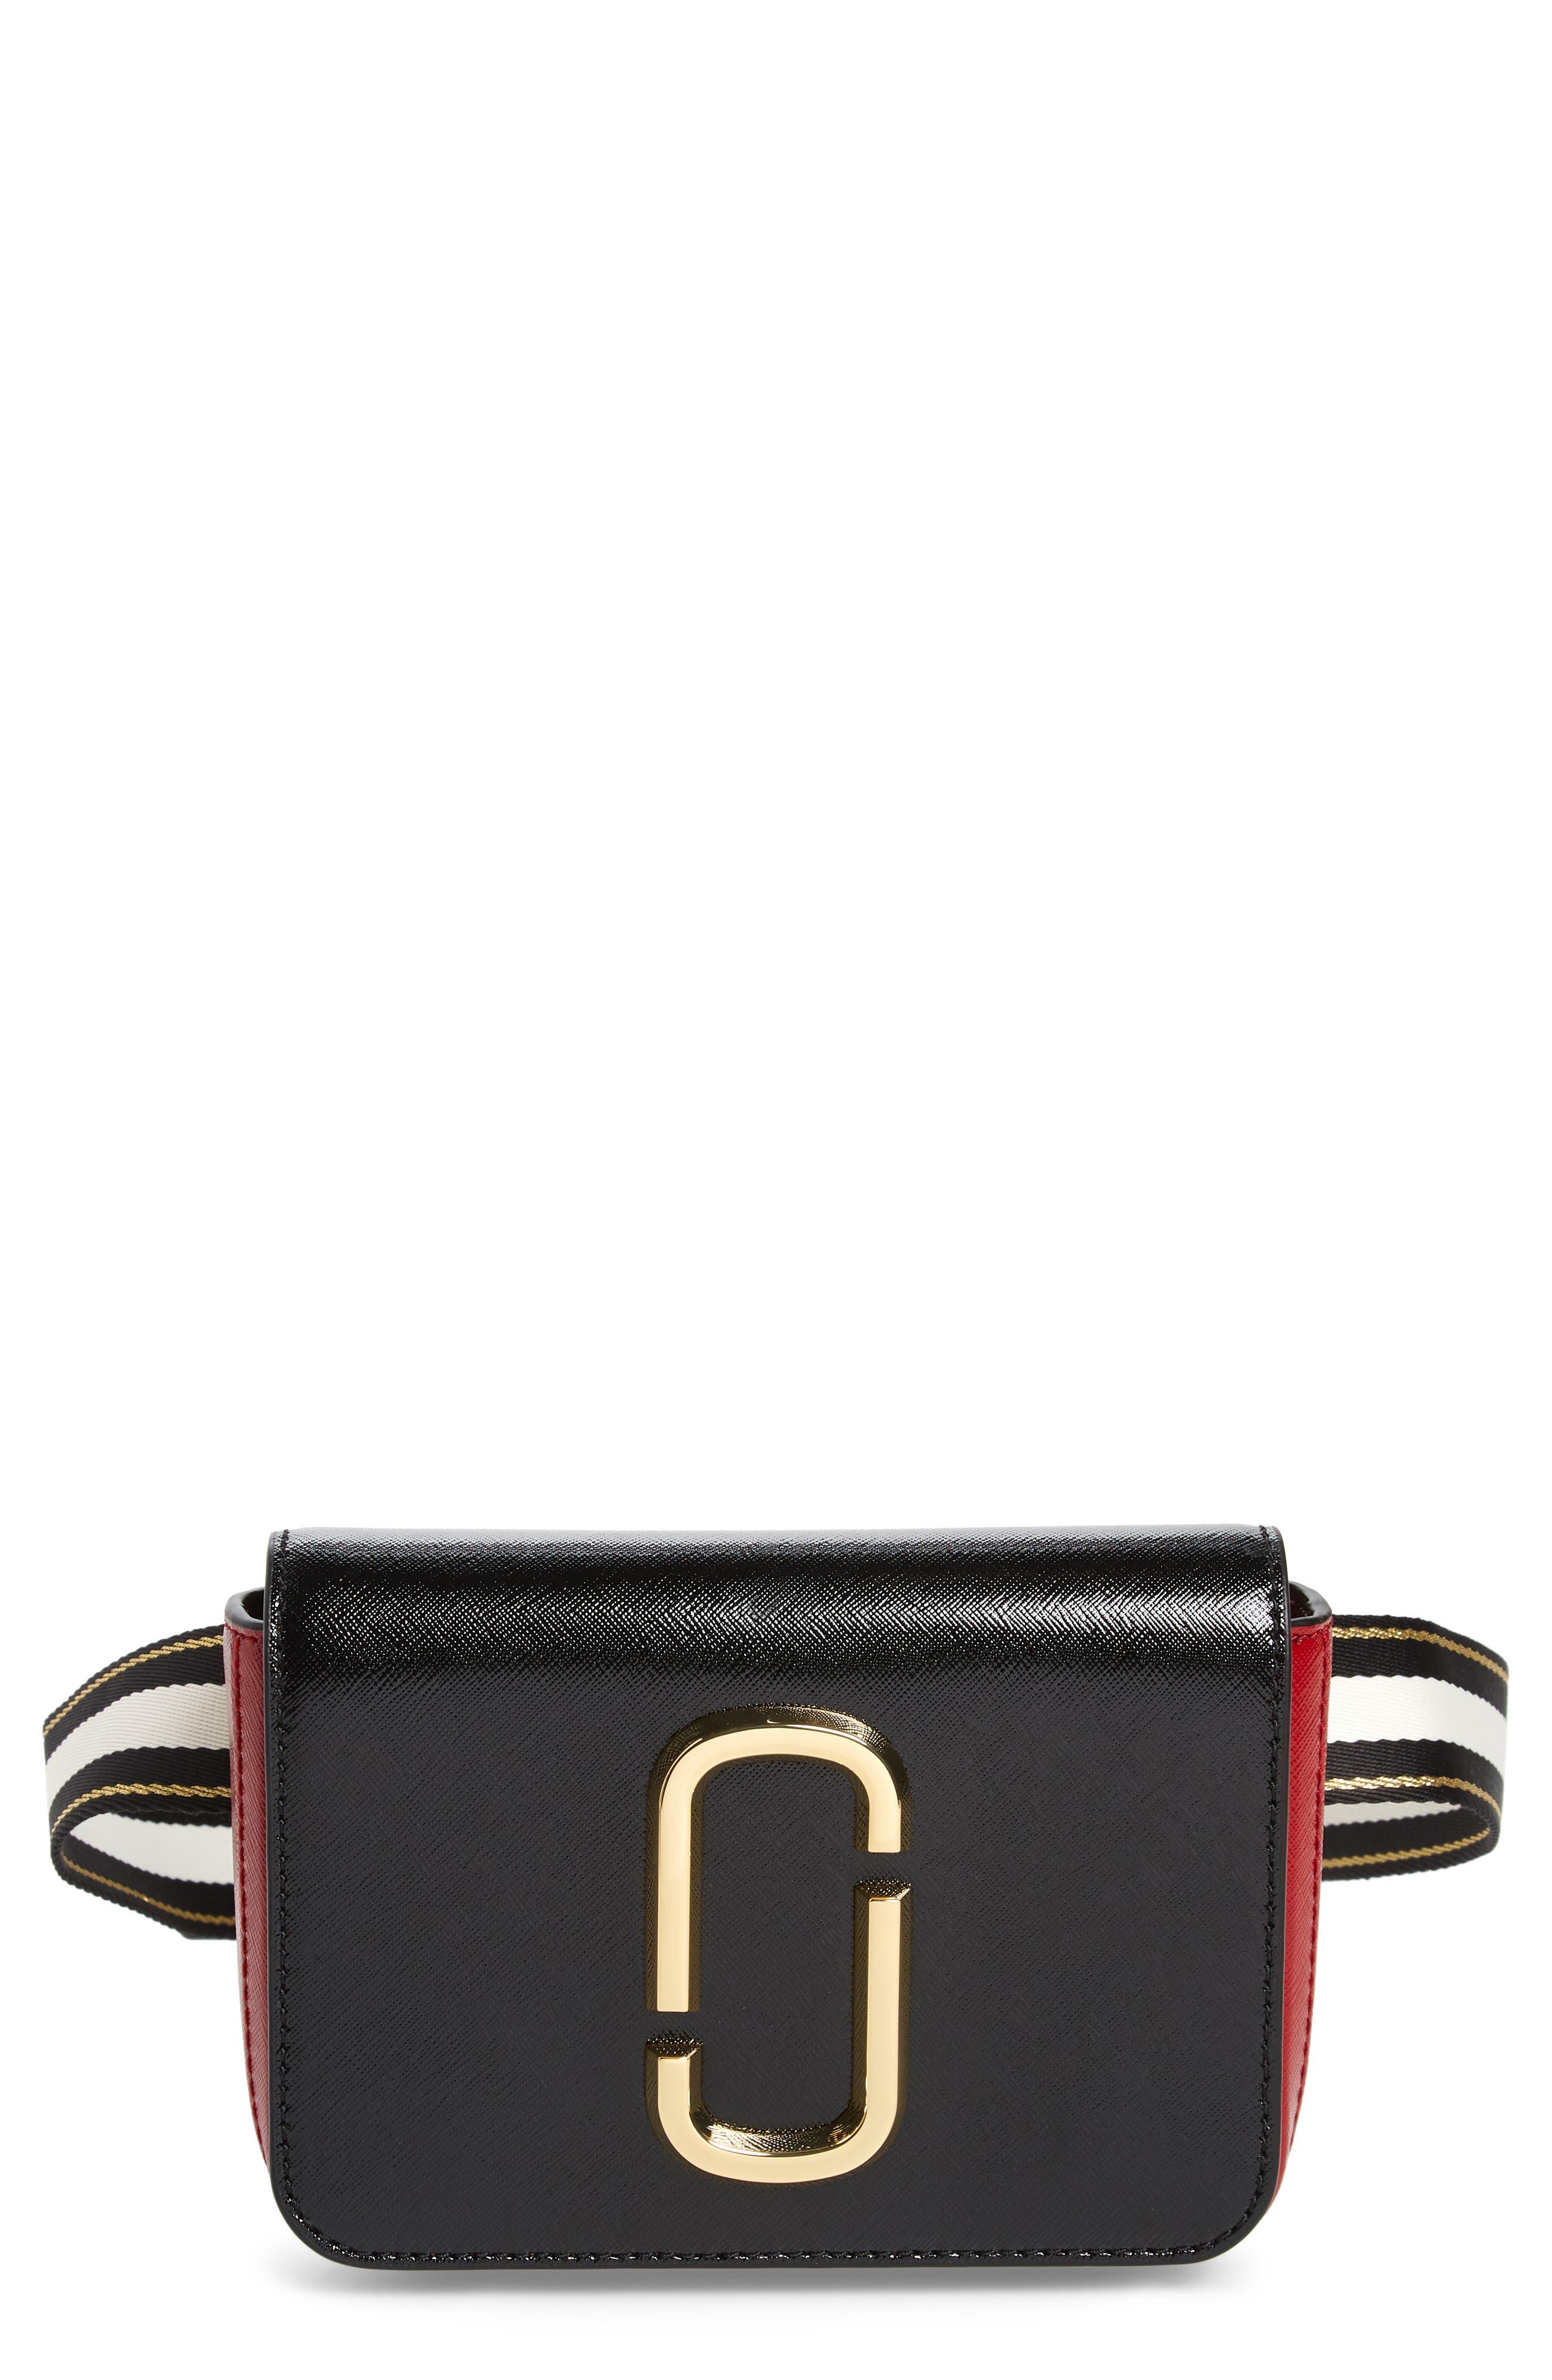 MARC JACOBS Hip Shot Convertible Crossbody Bag, Main, color, BLACK/ RED